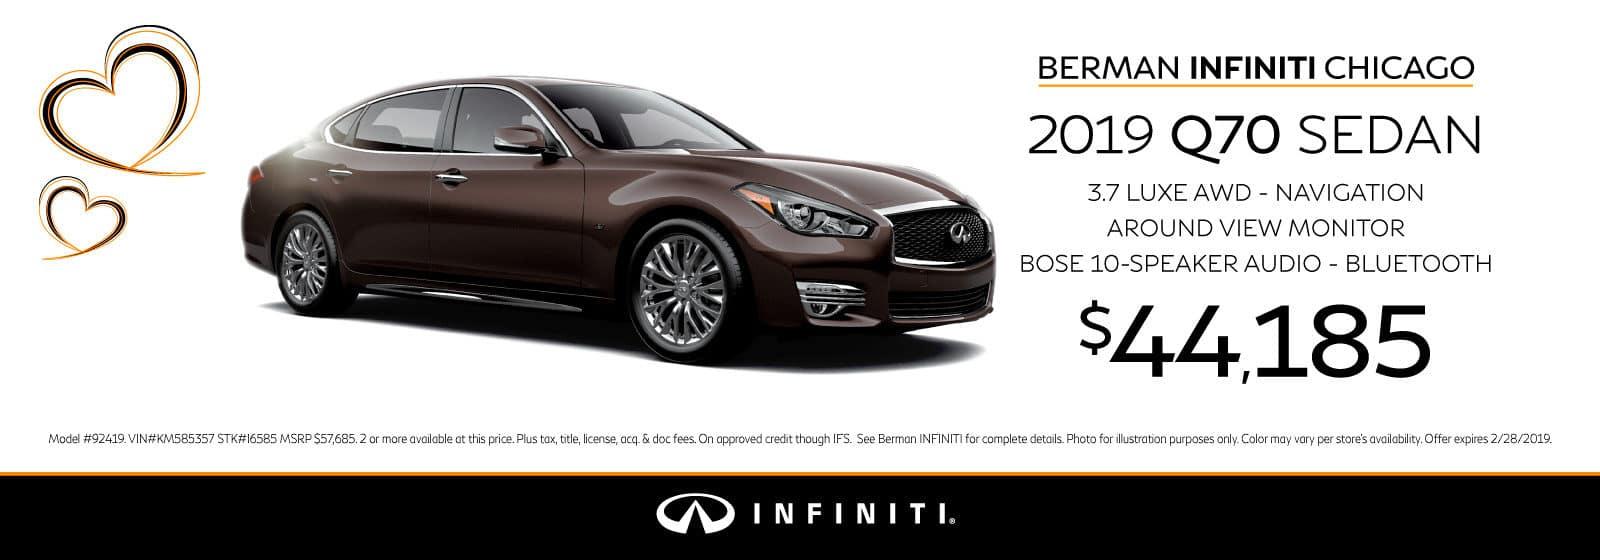 New 2019 INFINITI Q70 February offer at Berman INFINITI Chicago!